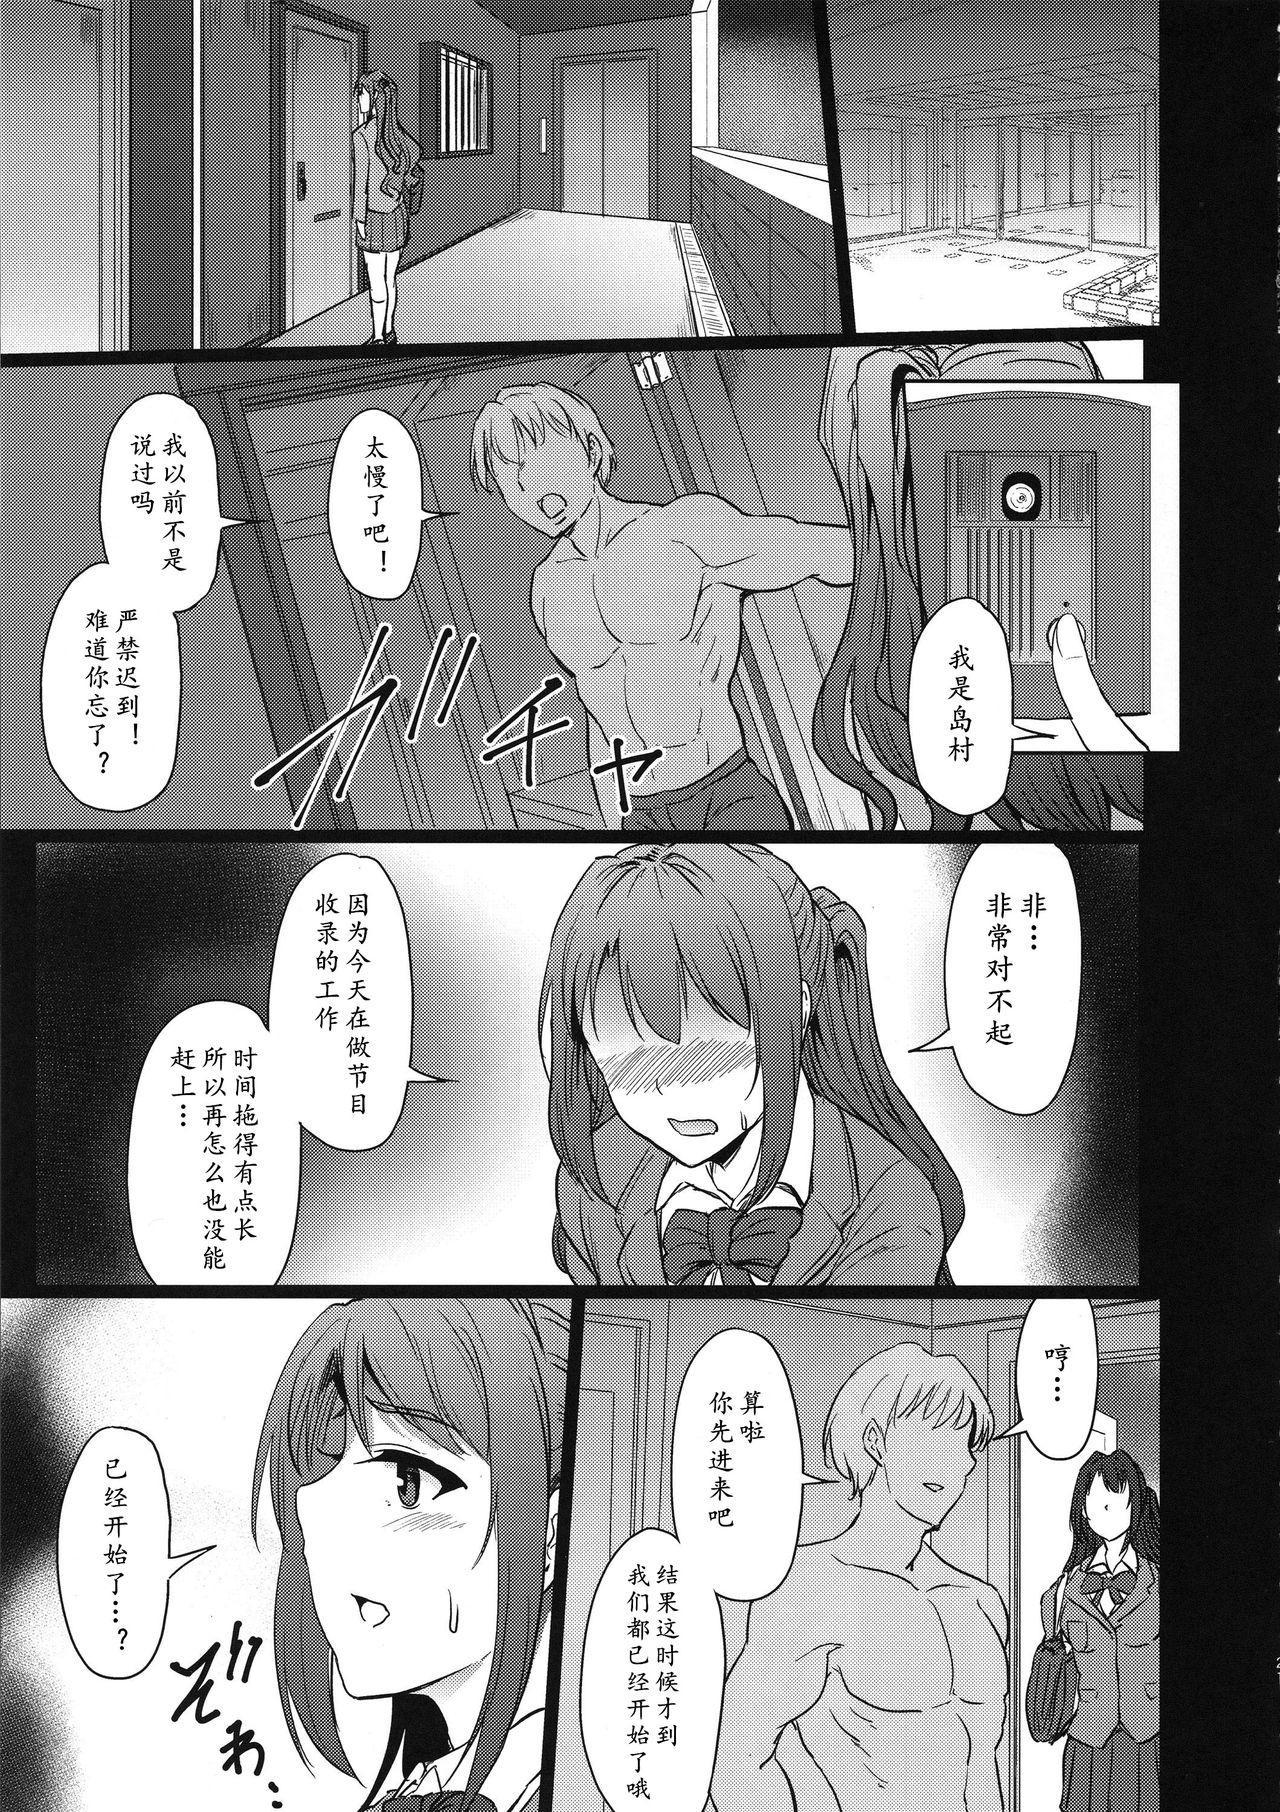 (C97) [MillionLove (Yayo)] Perfect Lesson 0 - Shimamura-ke Kanraku Hen (THE IDOLM@STER CINDERELLA GIRLS) [Chinese] [黄记汉化组] 20